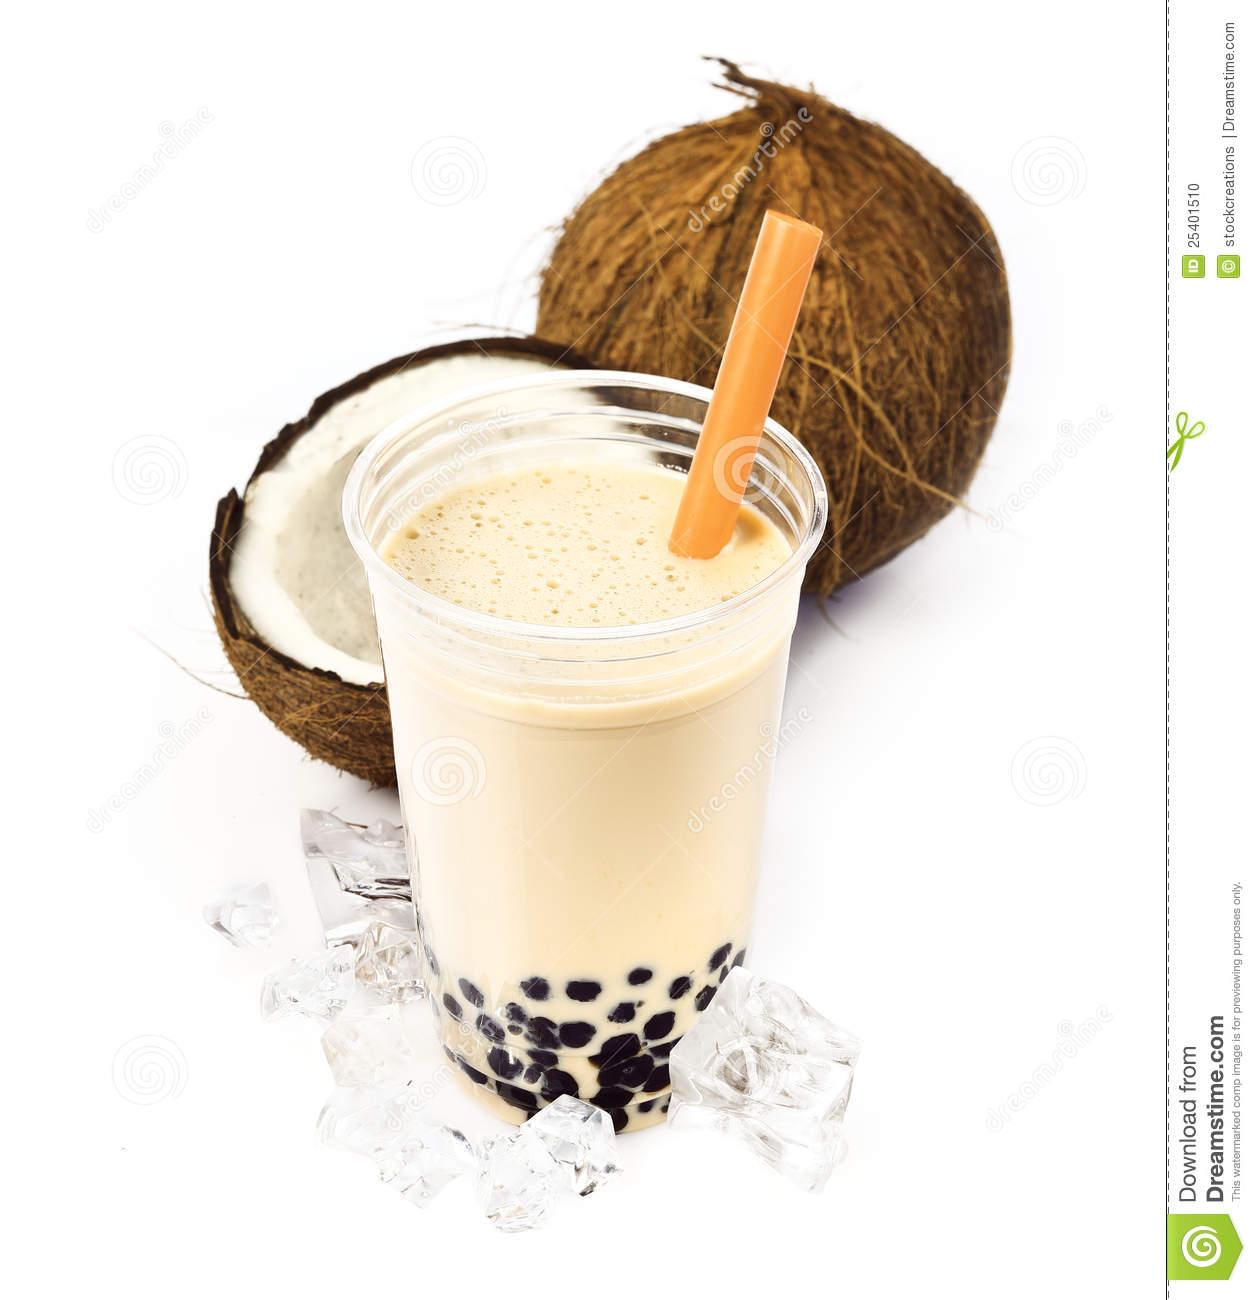 coconut-boba-bubble-tea-25401510.jpg